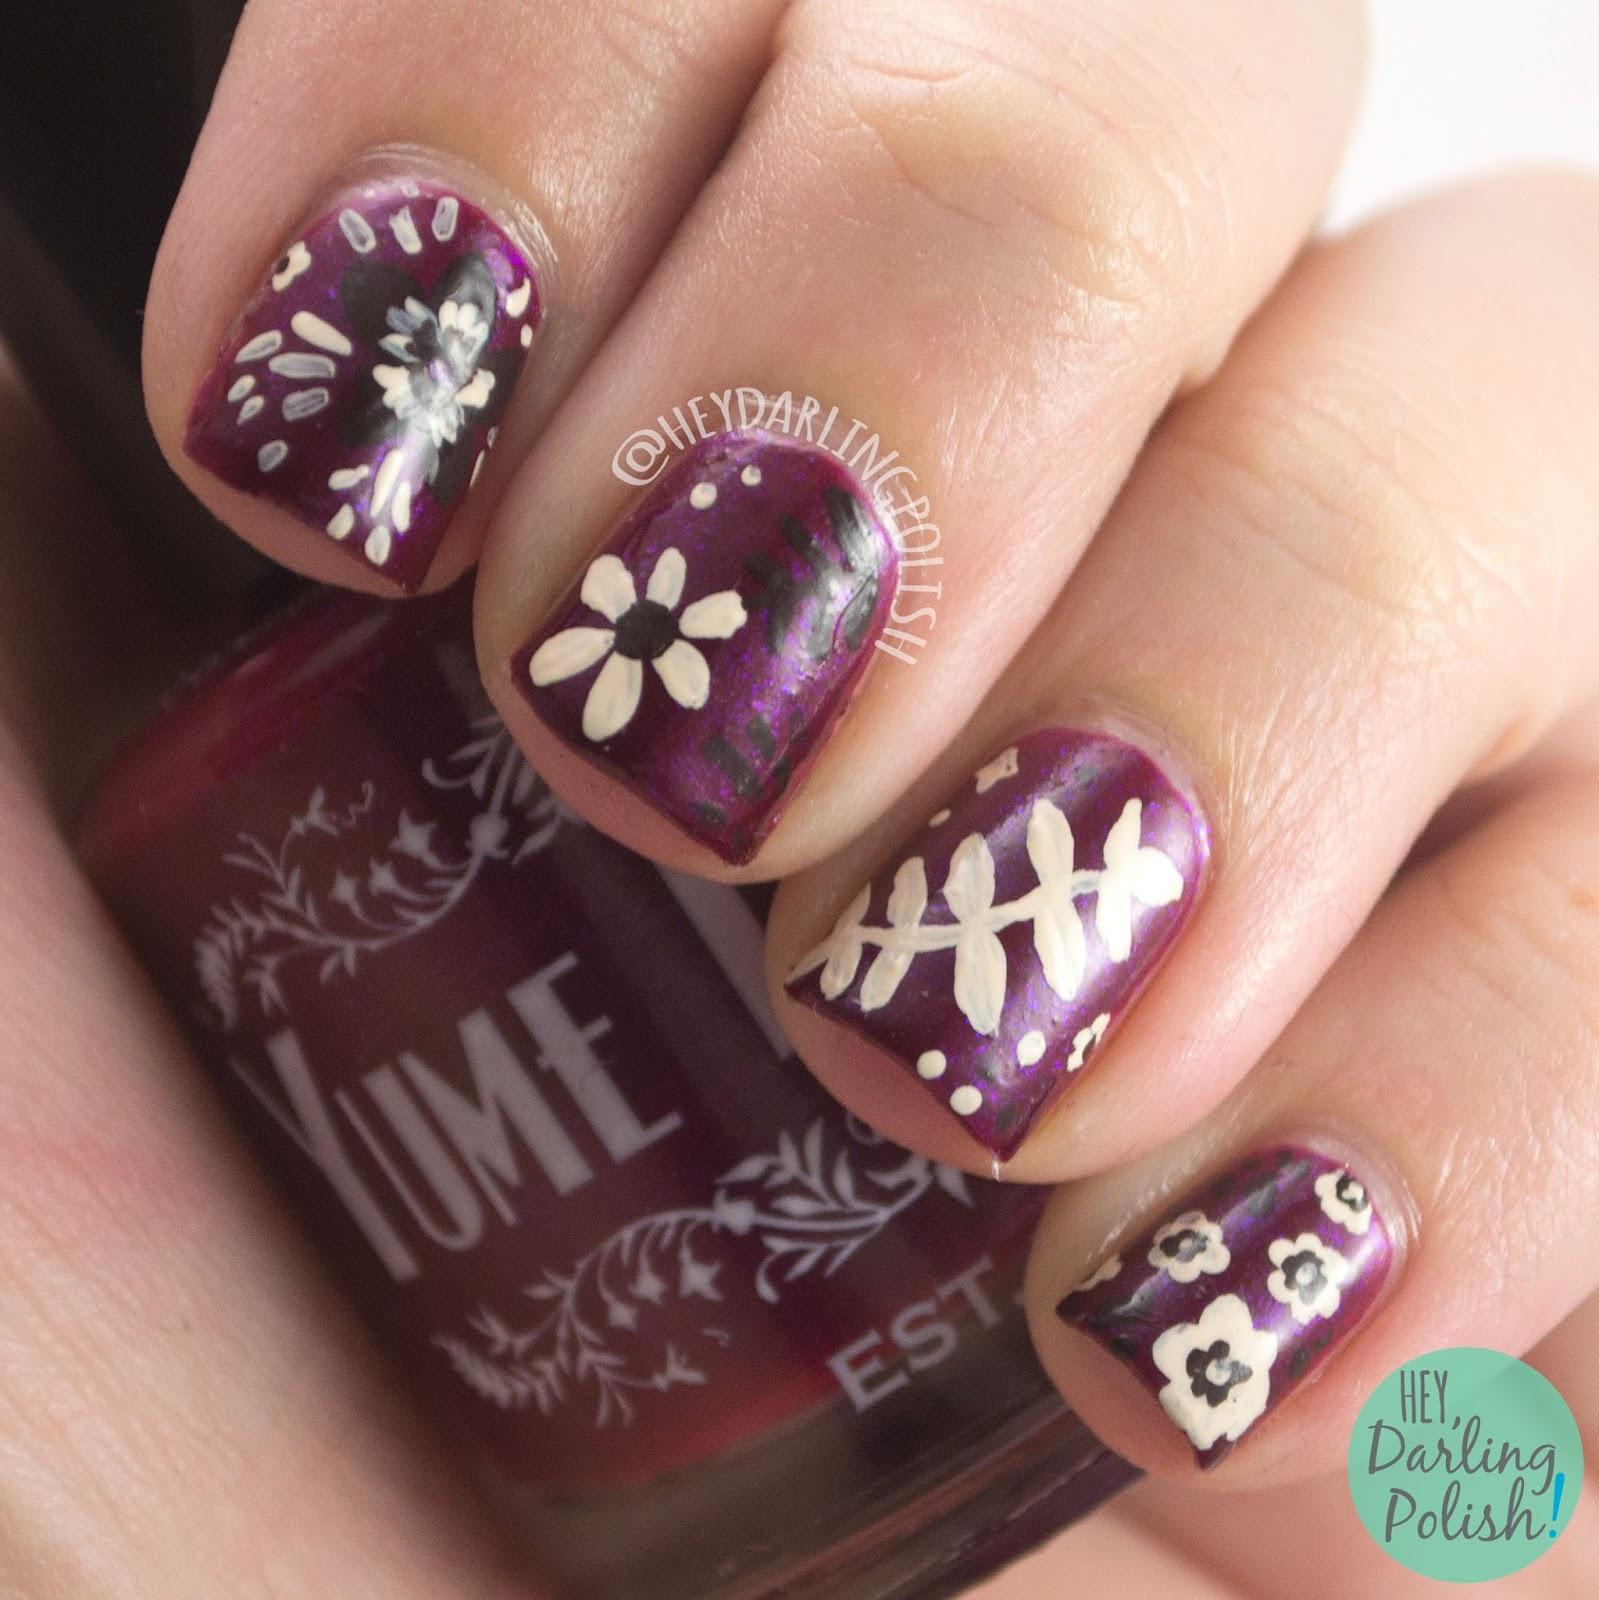 wine berry, flame warrior, floral, autumn, nails, nail art, nail polish, indie polish, yume lacquer, sailor moon,